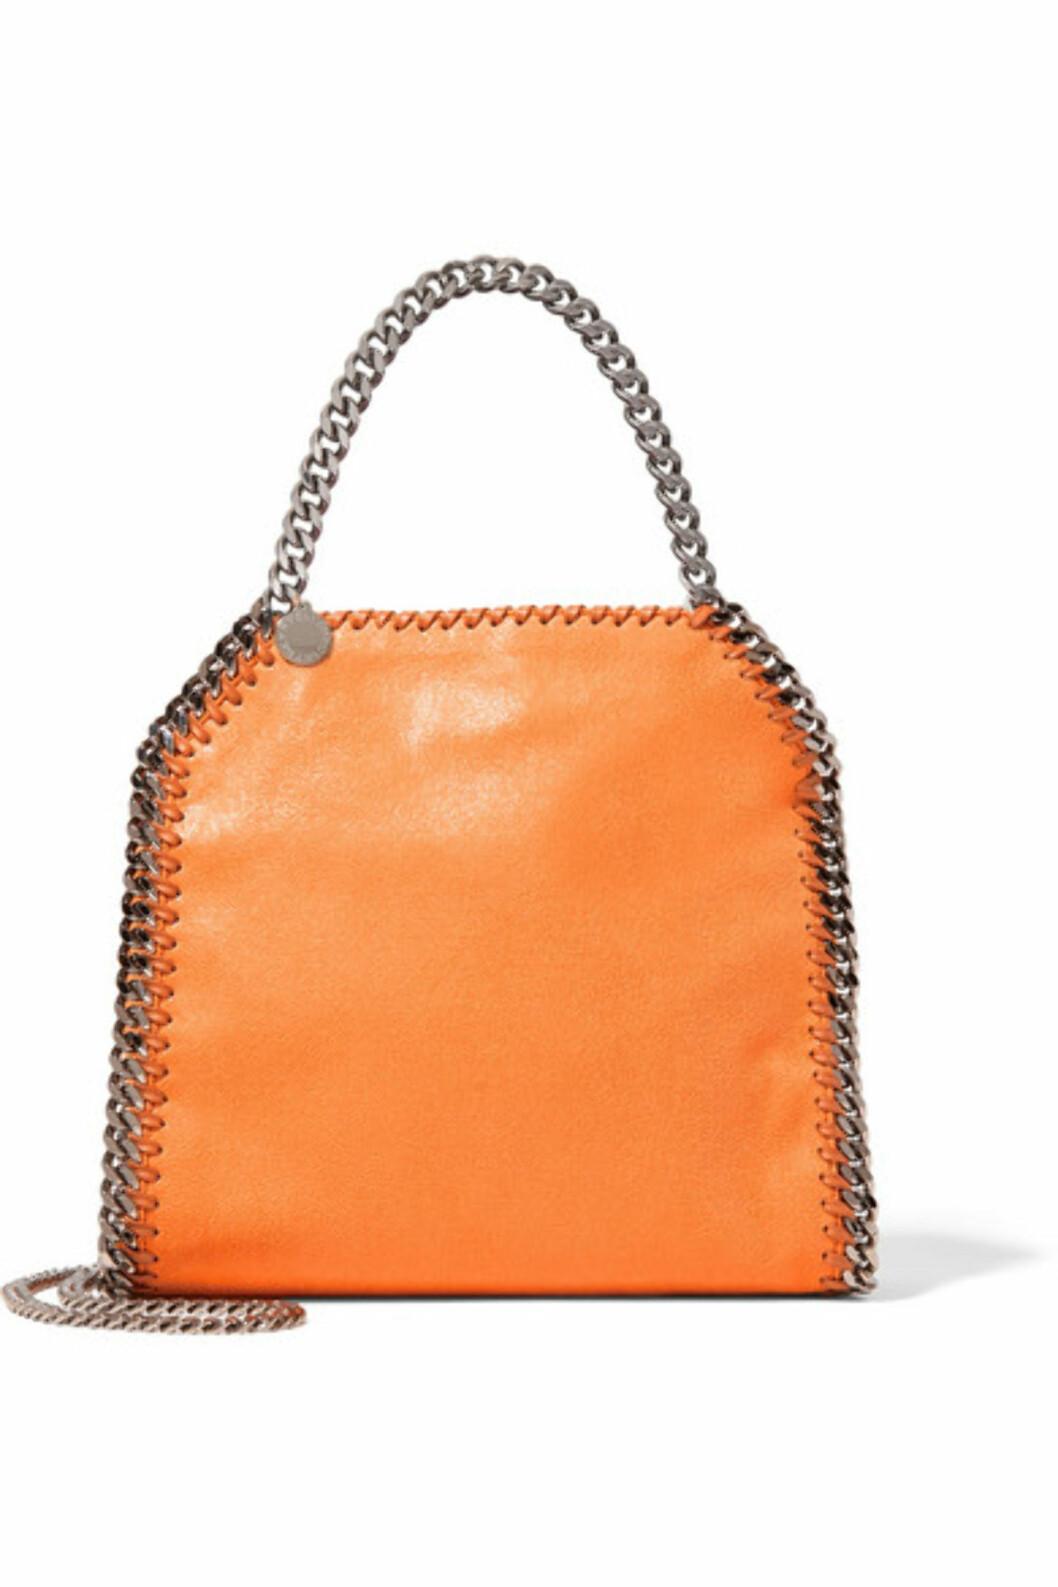 Veske fra Stella McCartney via Net-a-porter.com | kr 6468 | https://www.net-a-porter.com/no/en/product/714687/stella_mccartney/the-falabella-mini-faux-brushed-leather-tote